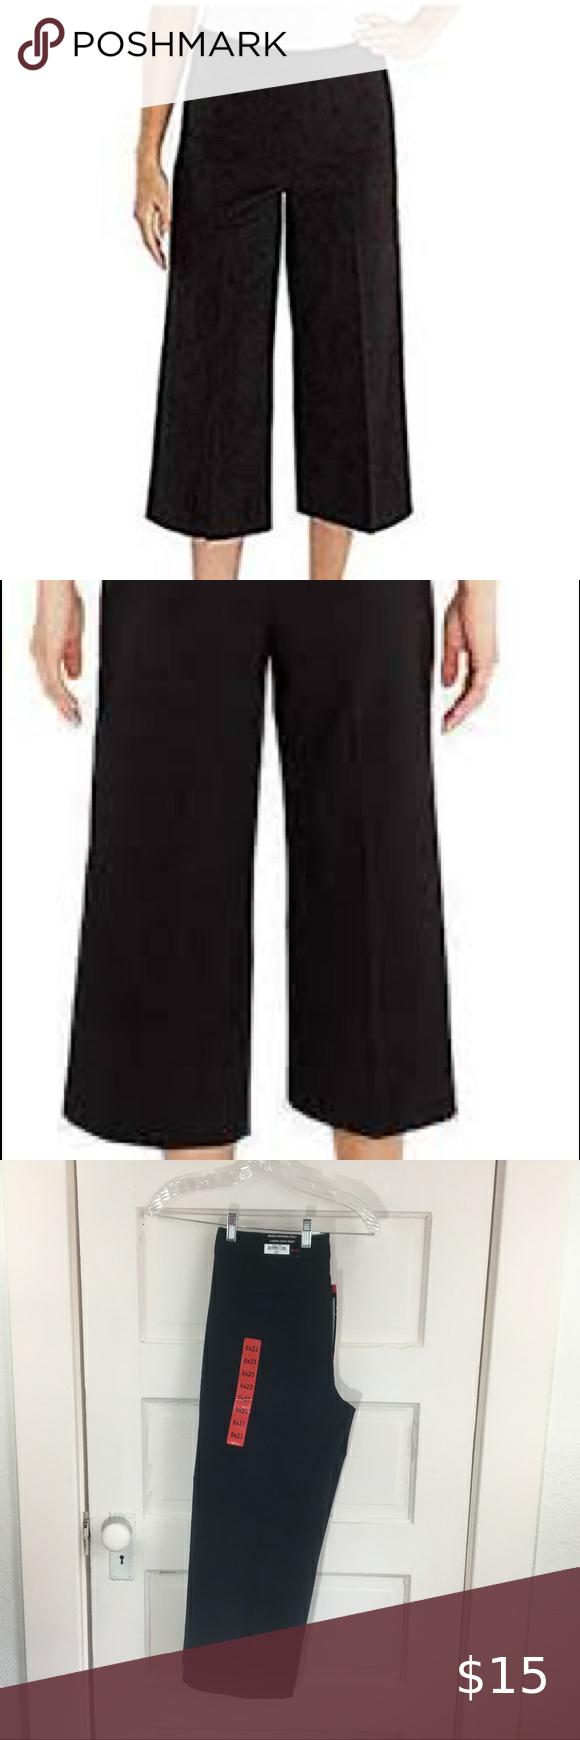 Mario Serrani Capri Black Dress Work Pants Nwt Dresses For Work Capri Dress Pants Super Cute Dresses [ 1740 x 580 Pixel ]